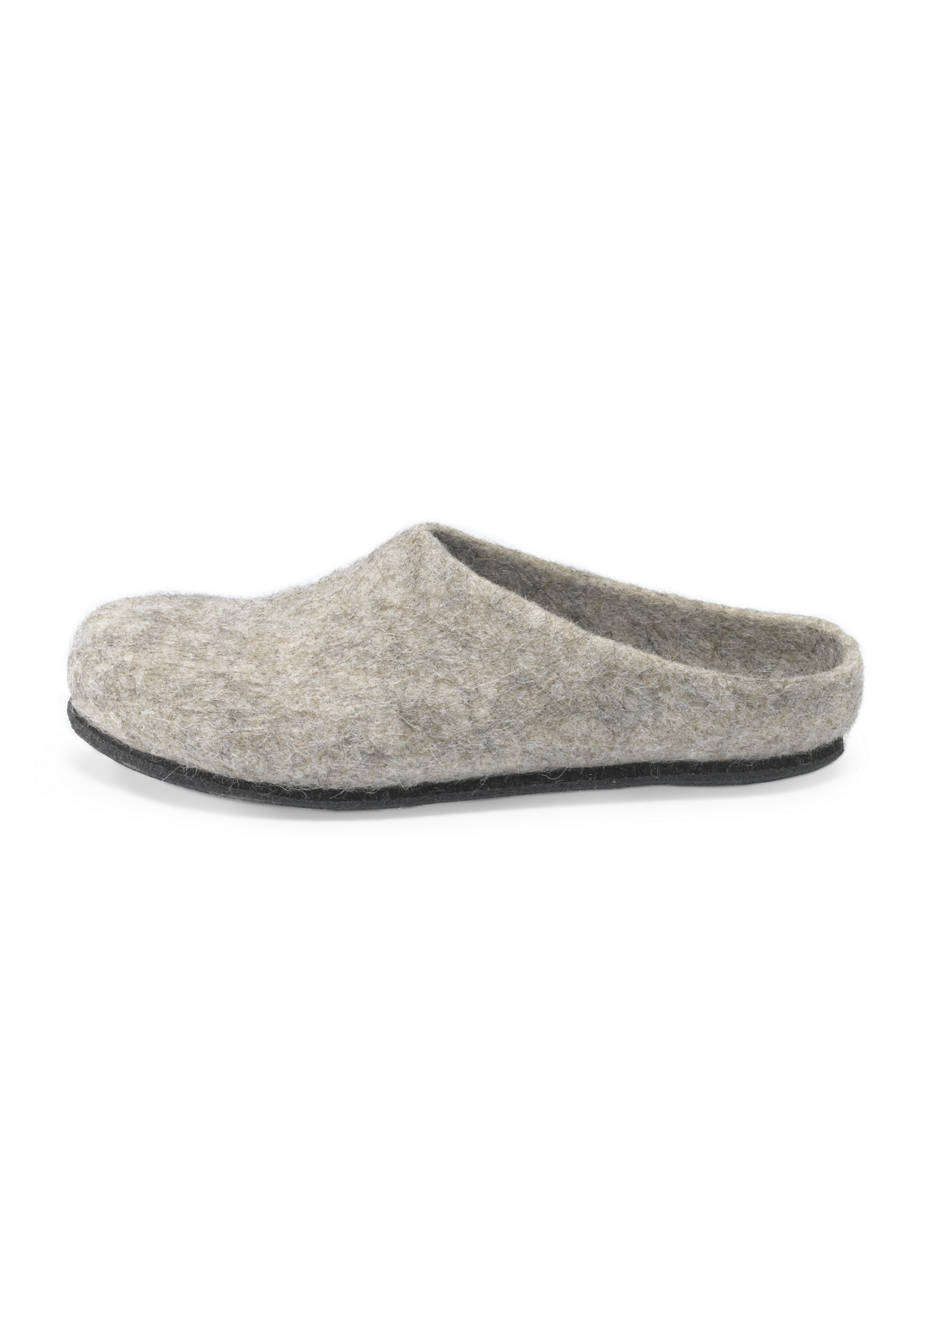 Alpaca slipper